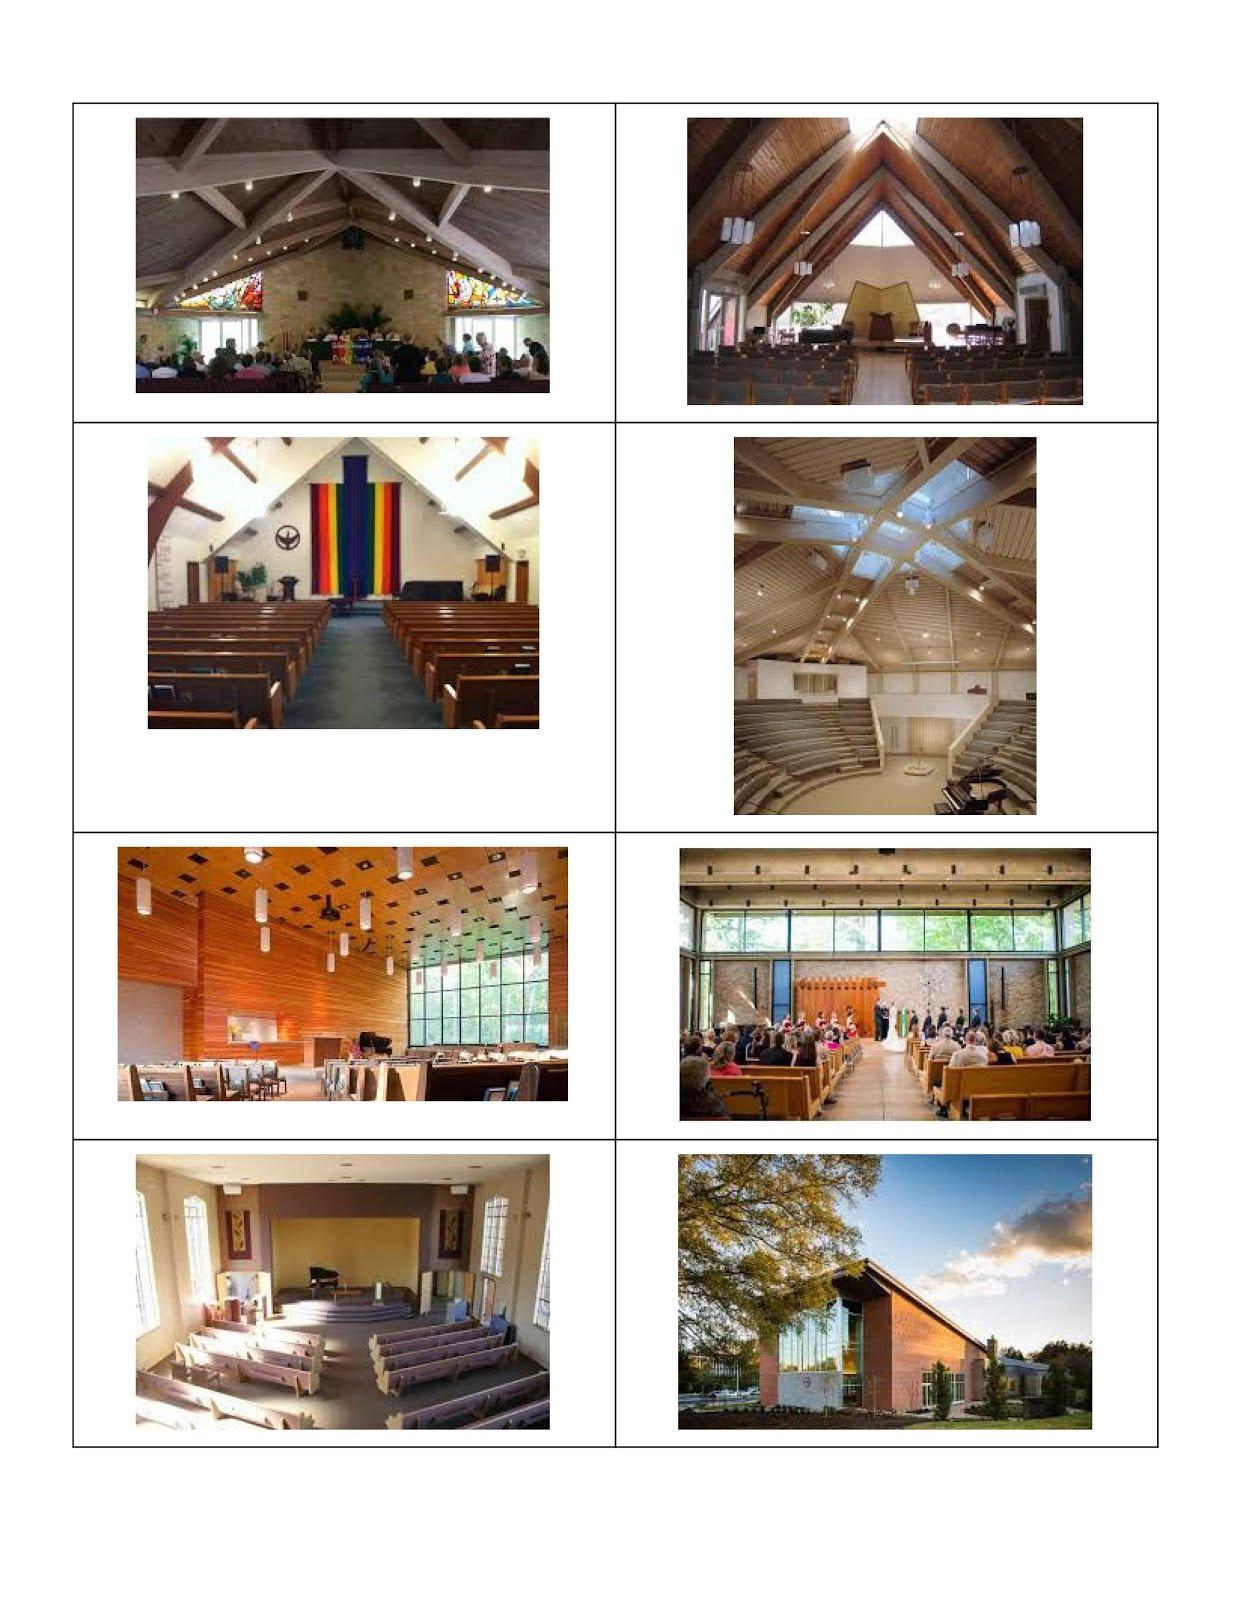 UU Churches